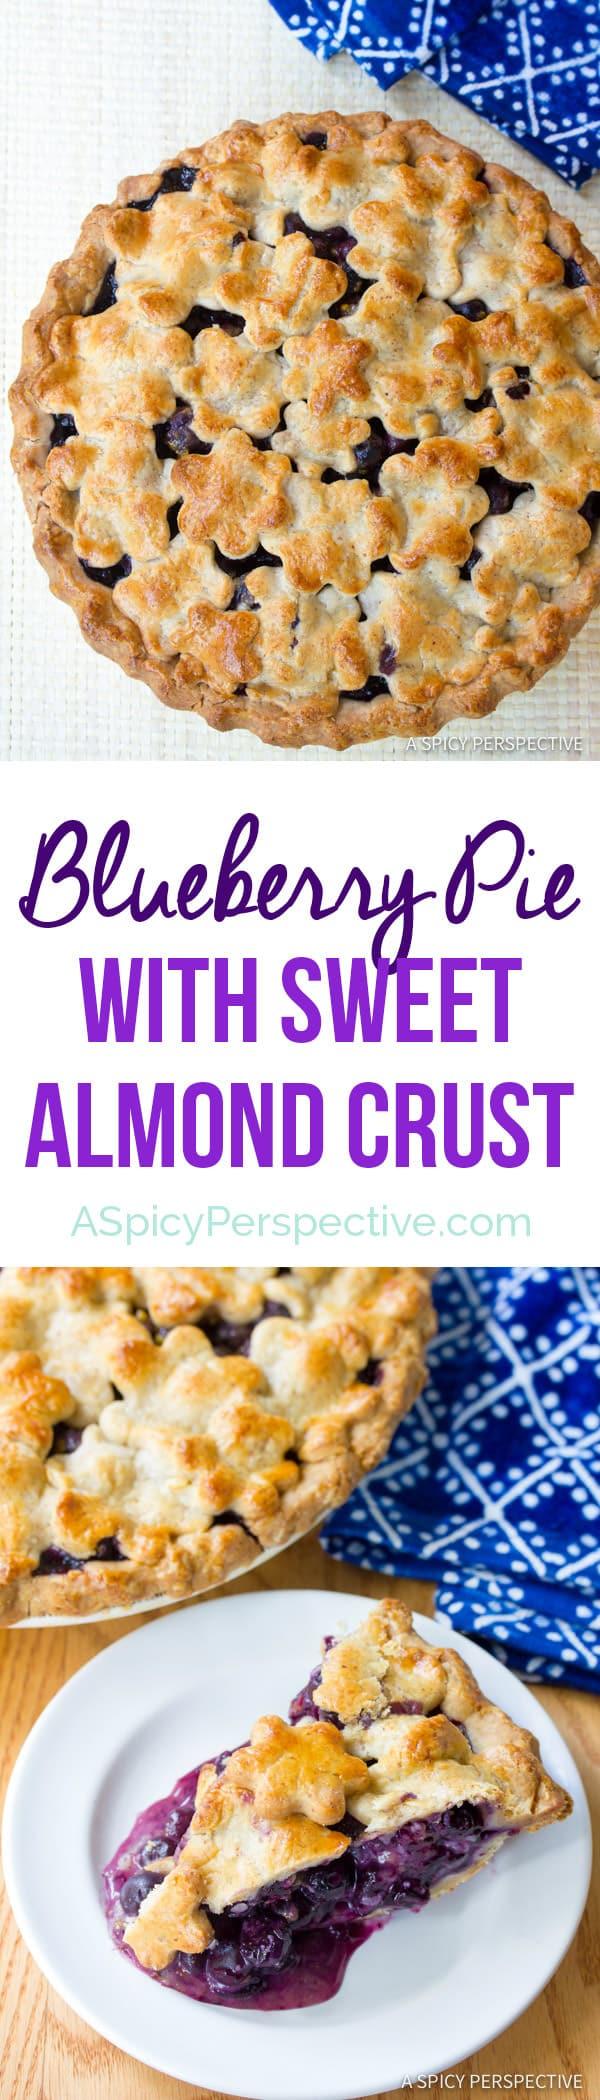 Fresh Blueberry Pie with Almond Pie Crust | ASpicyPerspective.com